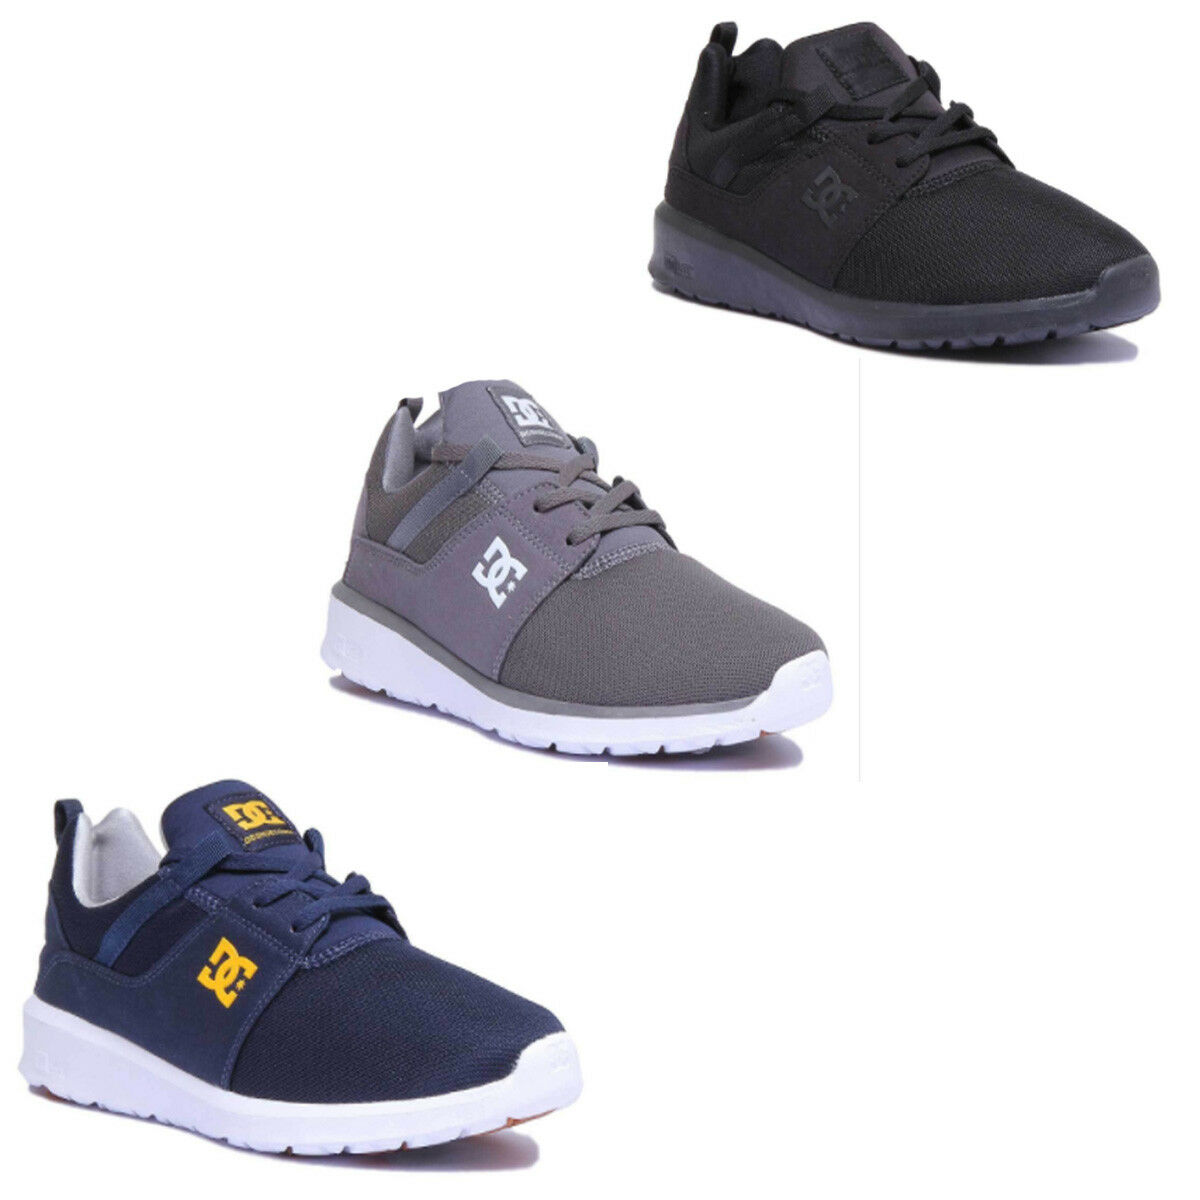 DC Schuhes Trainers Heathrow Men Miscellaneous Grau Trainers Schuhes Größe UK 6 -12 0232c4